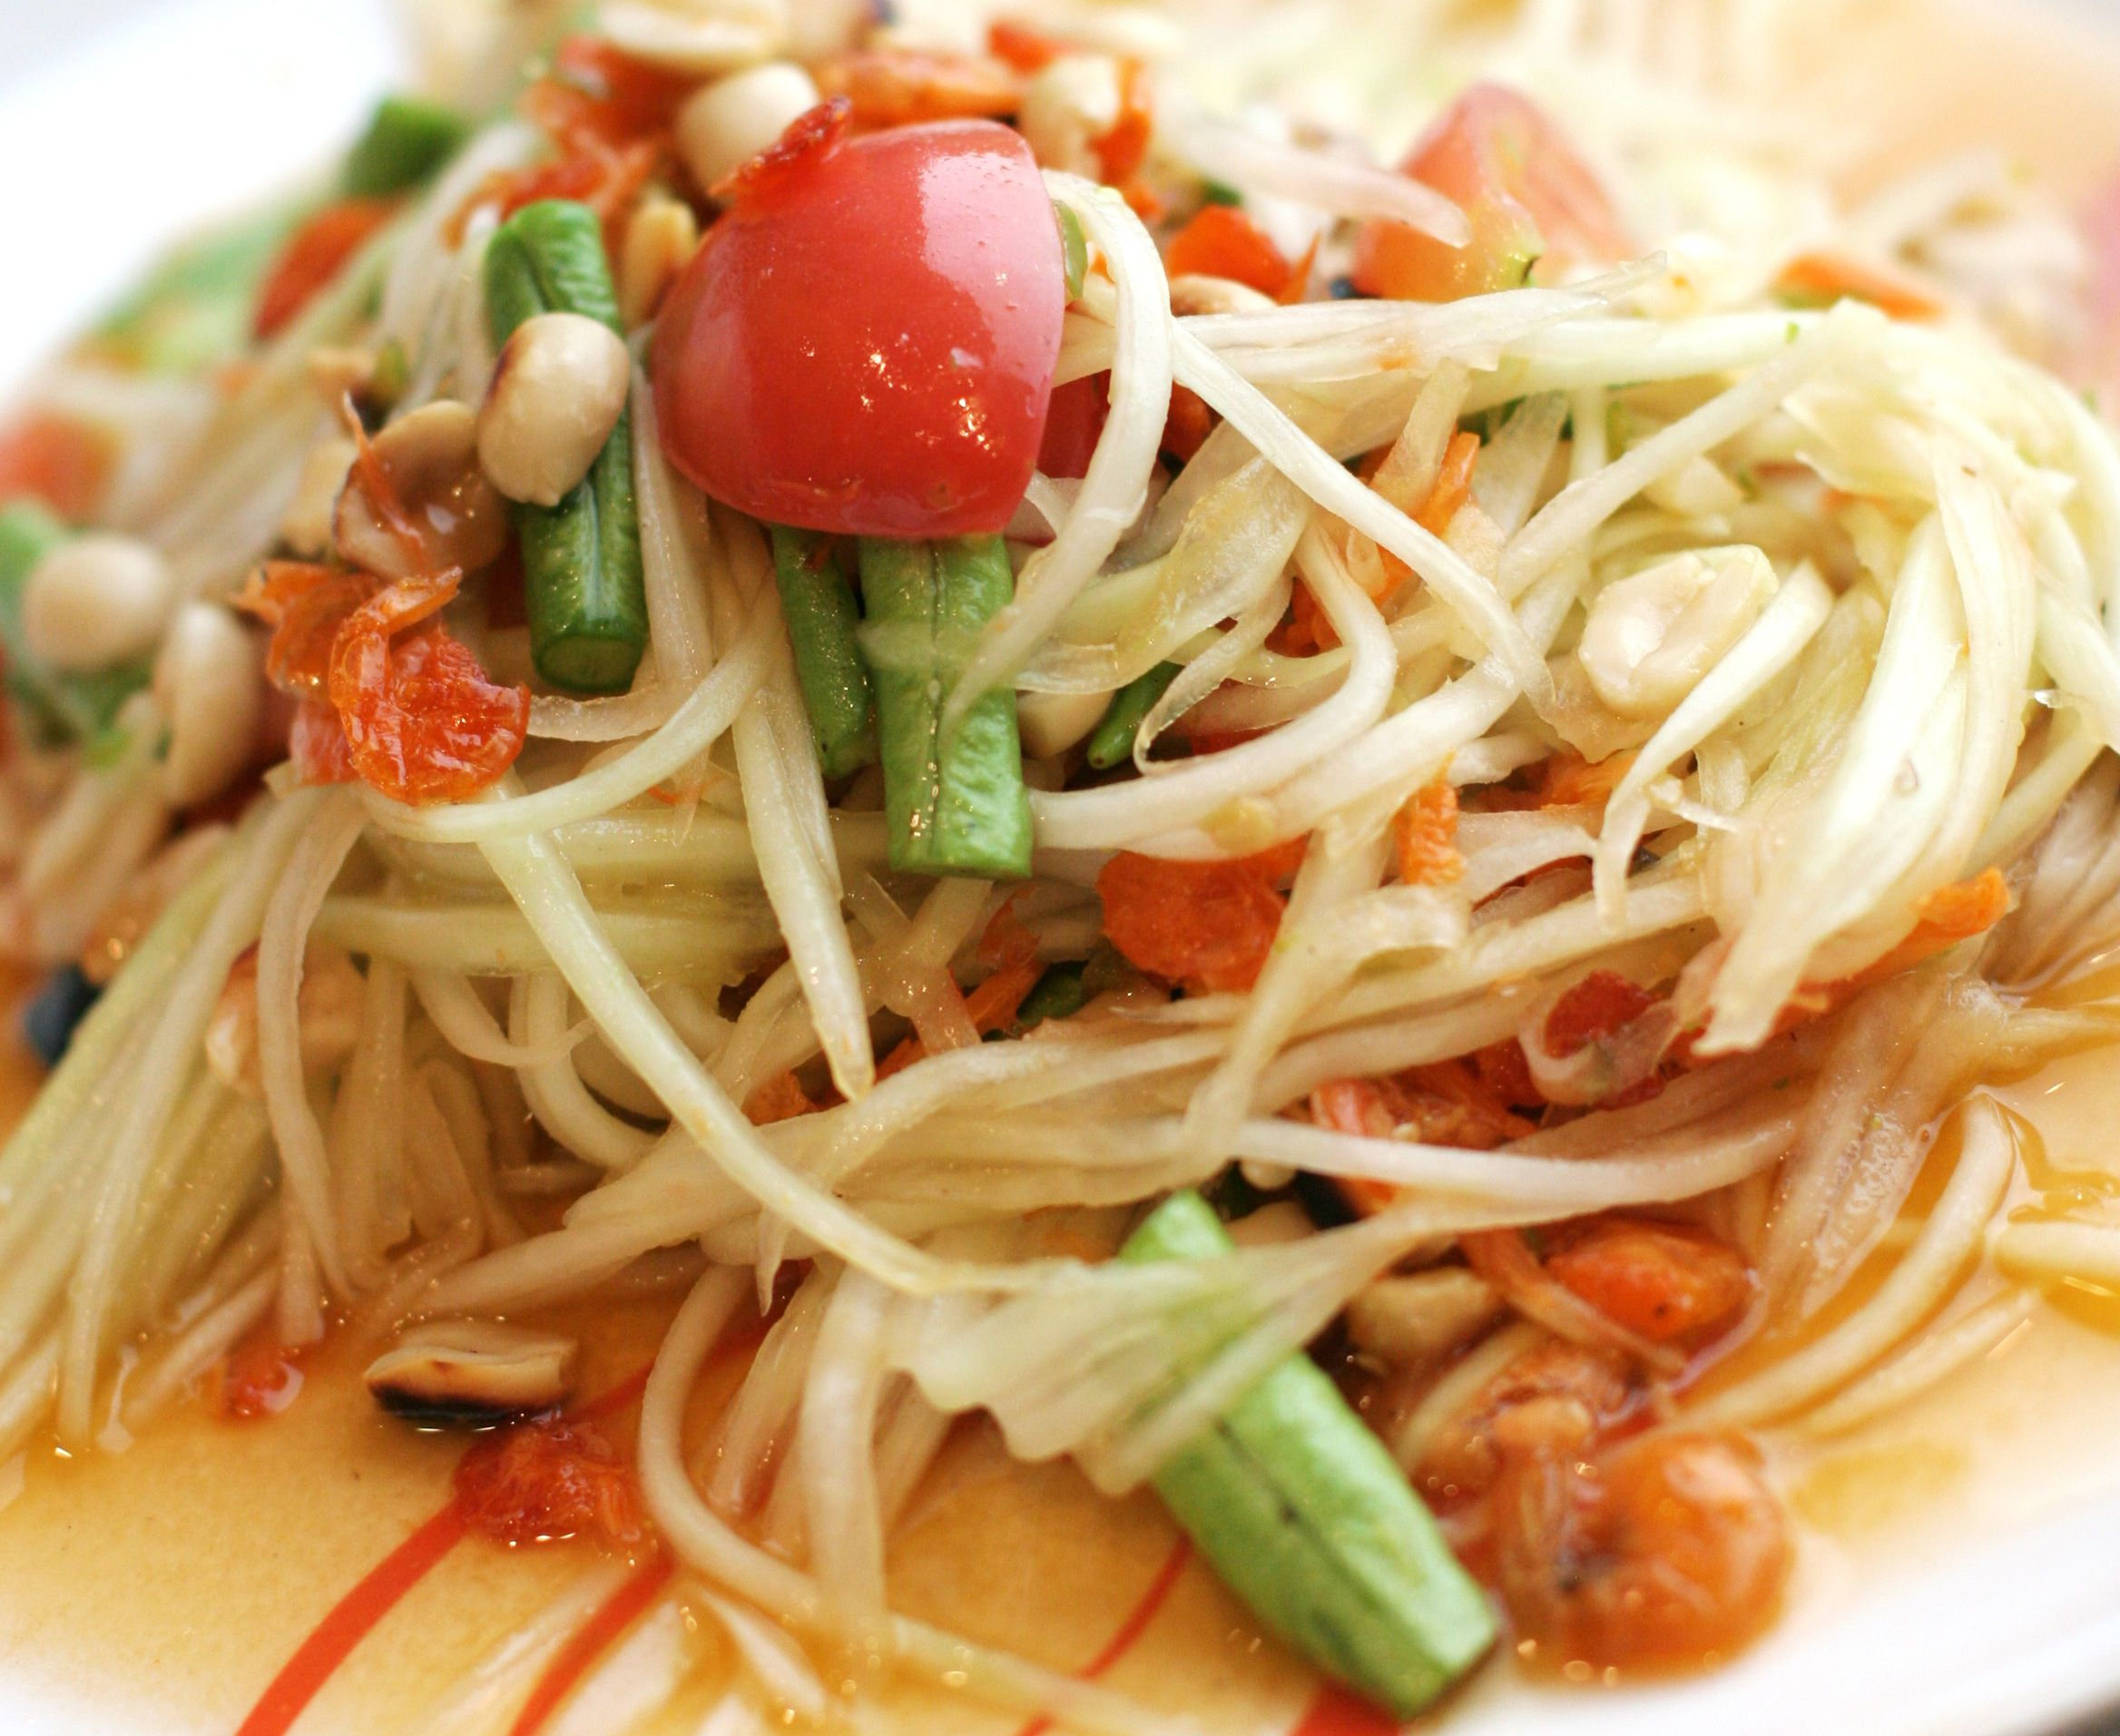 79. Papaya salad